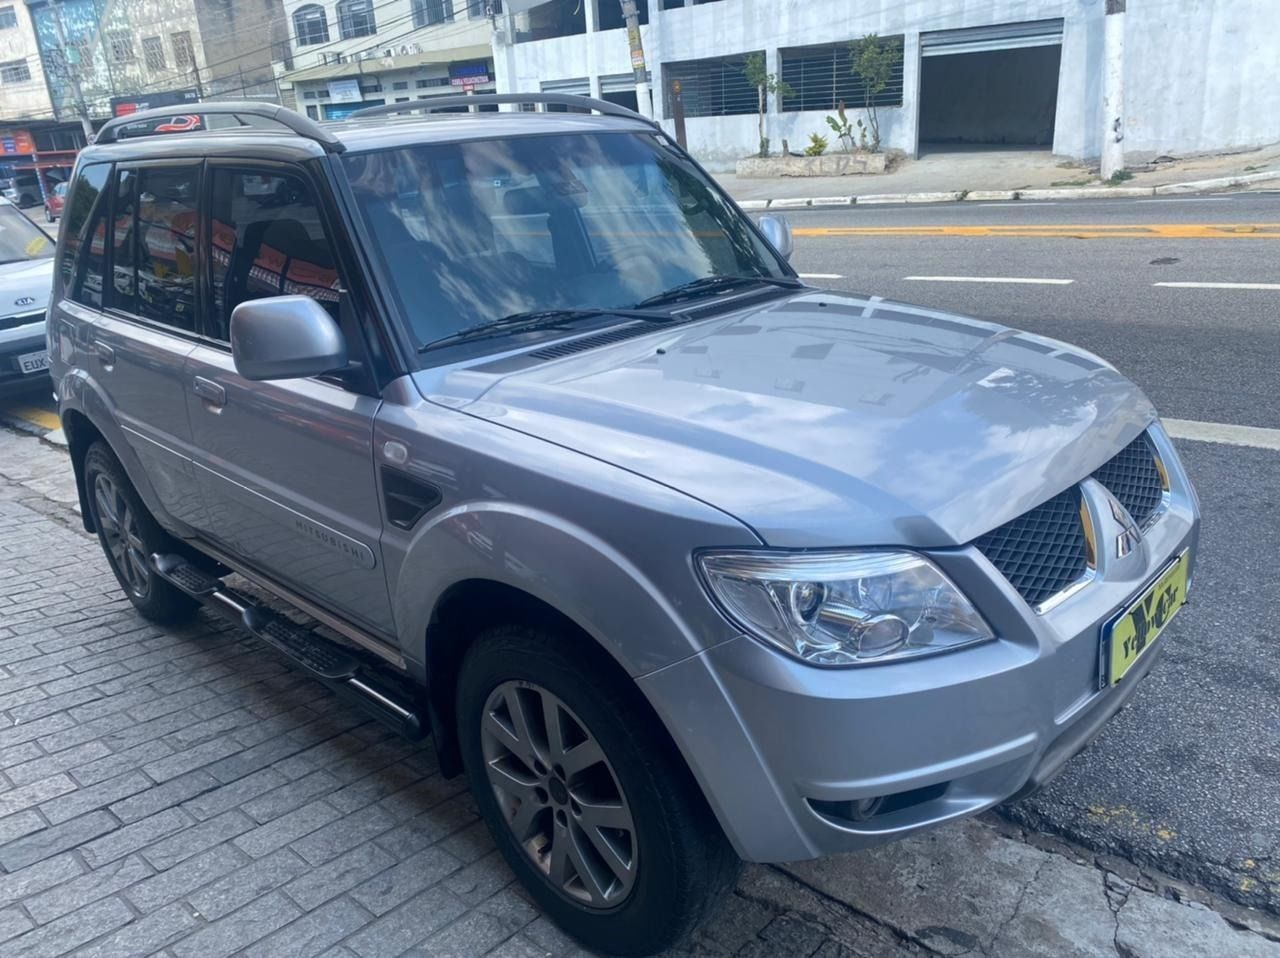 //www.autoline.com.br/carro/mitsubishi/pajero-tr4-20-16v-flex-4p-manual/2015/sao-paulo-sp/14729705